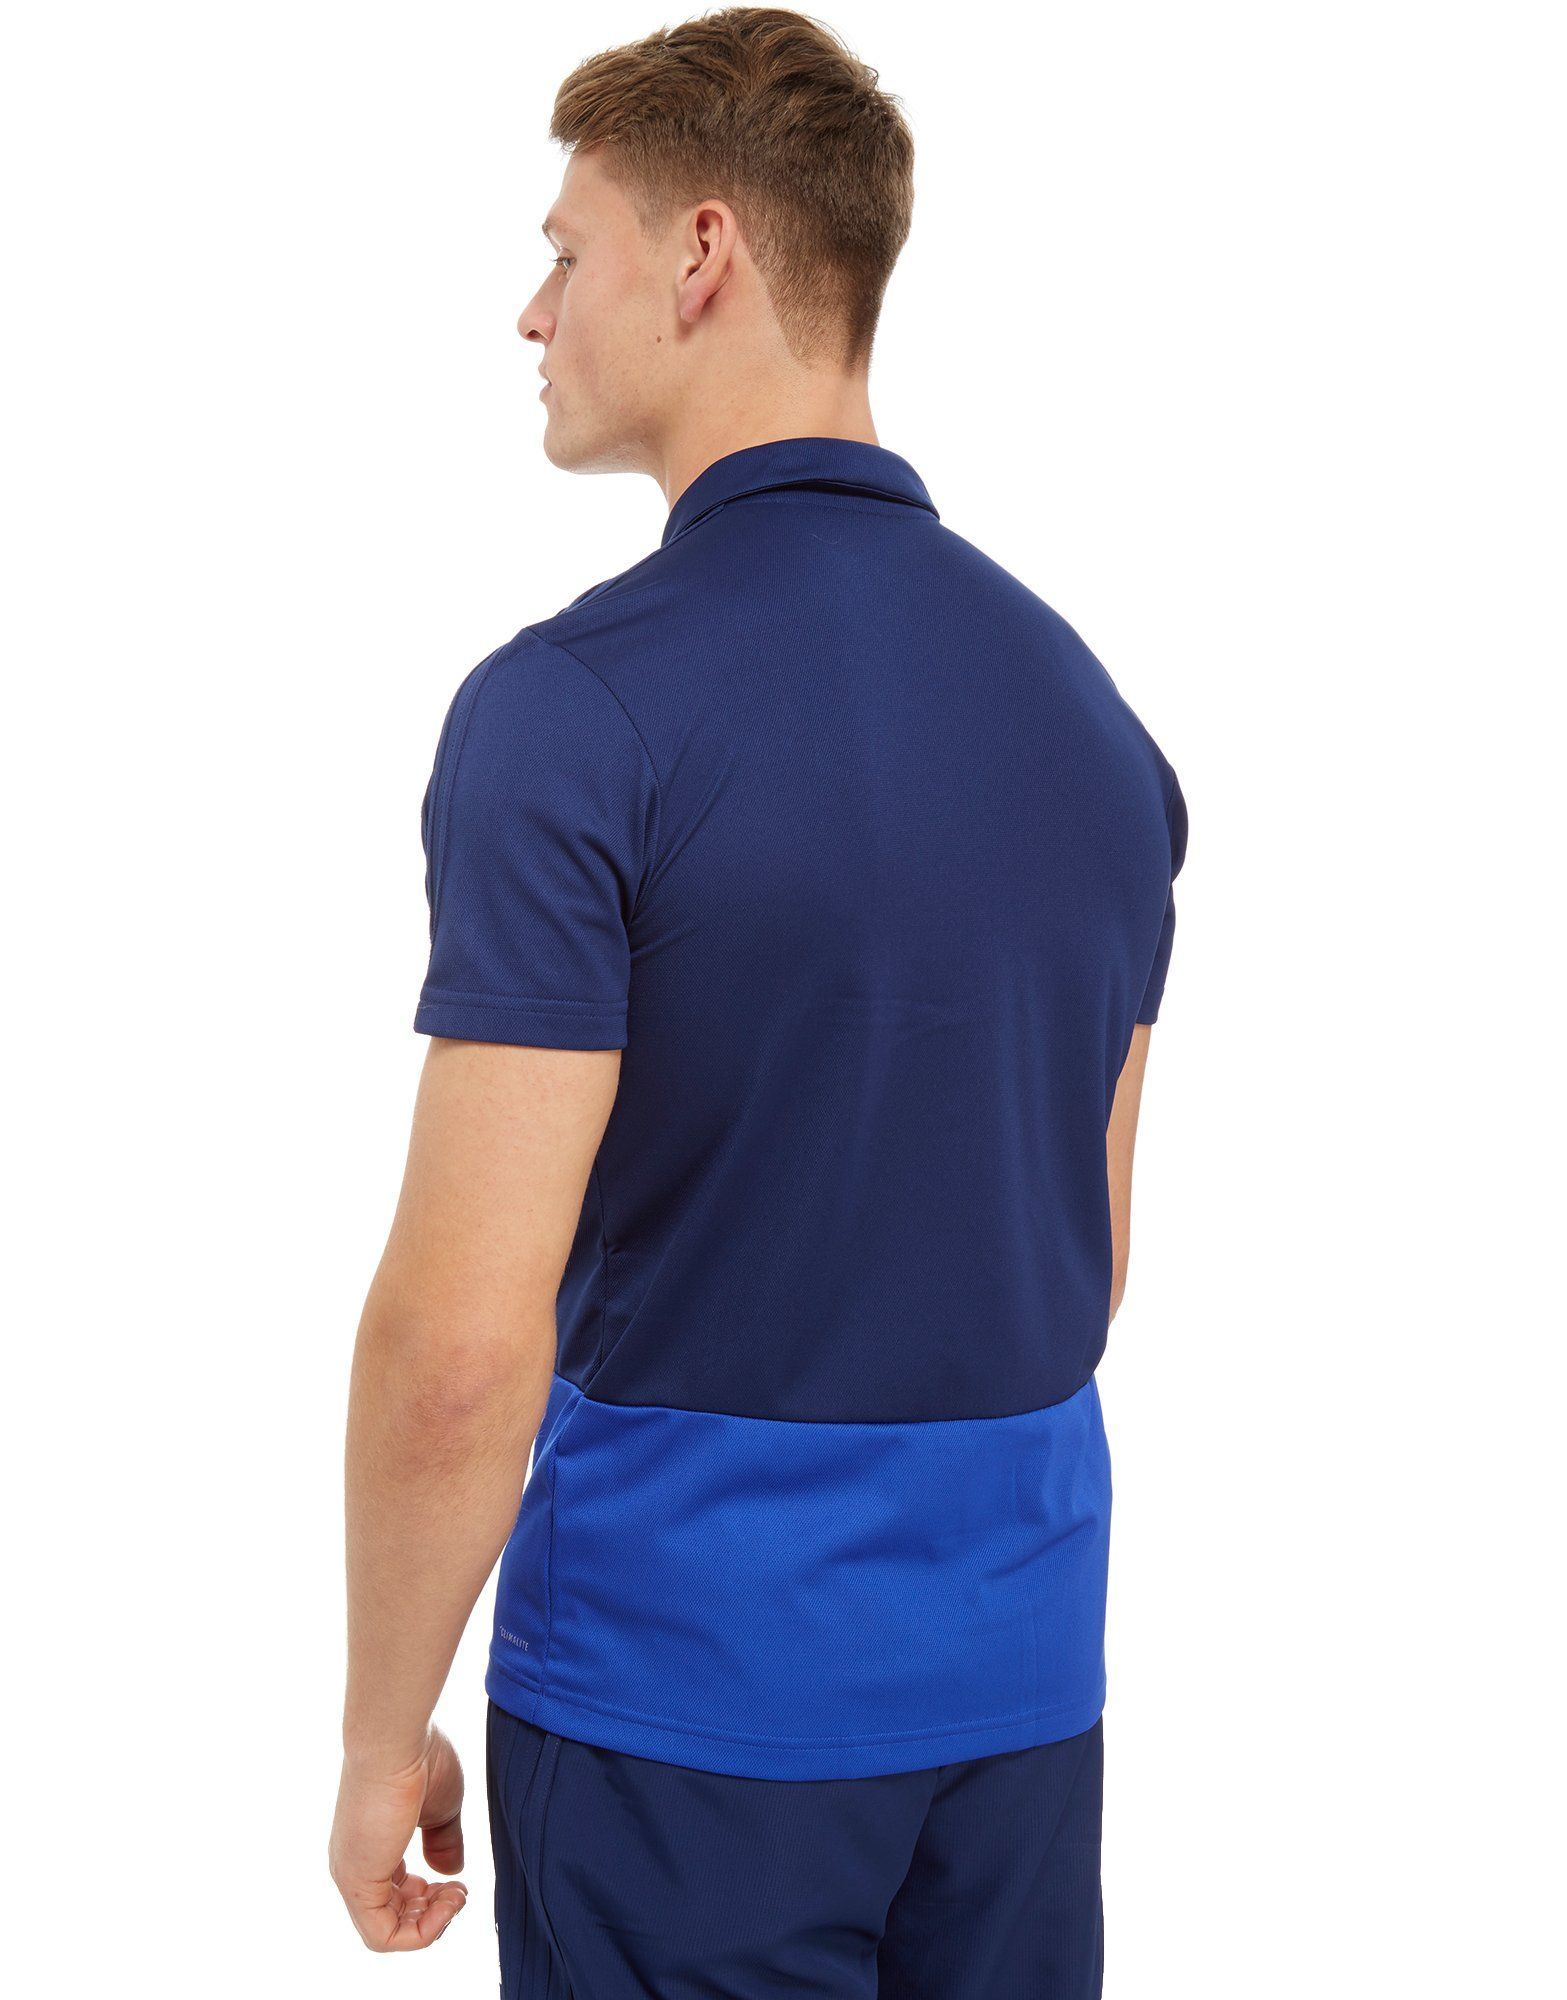 adidas Northern Ireland 2018/19 Polo Shirt Blau